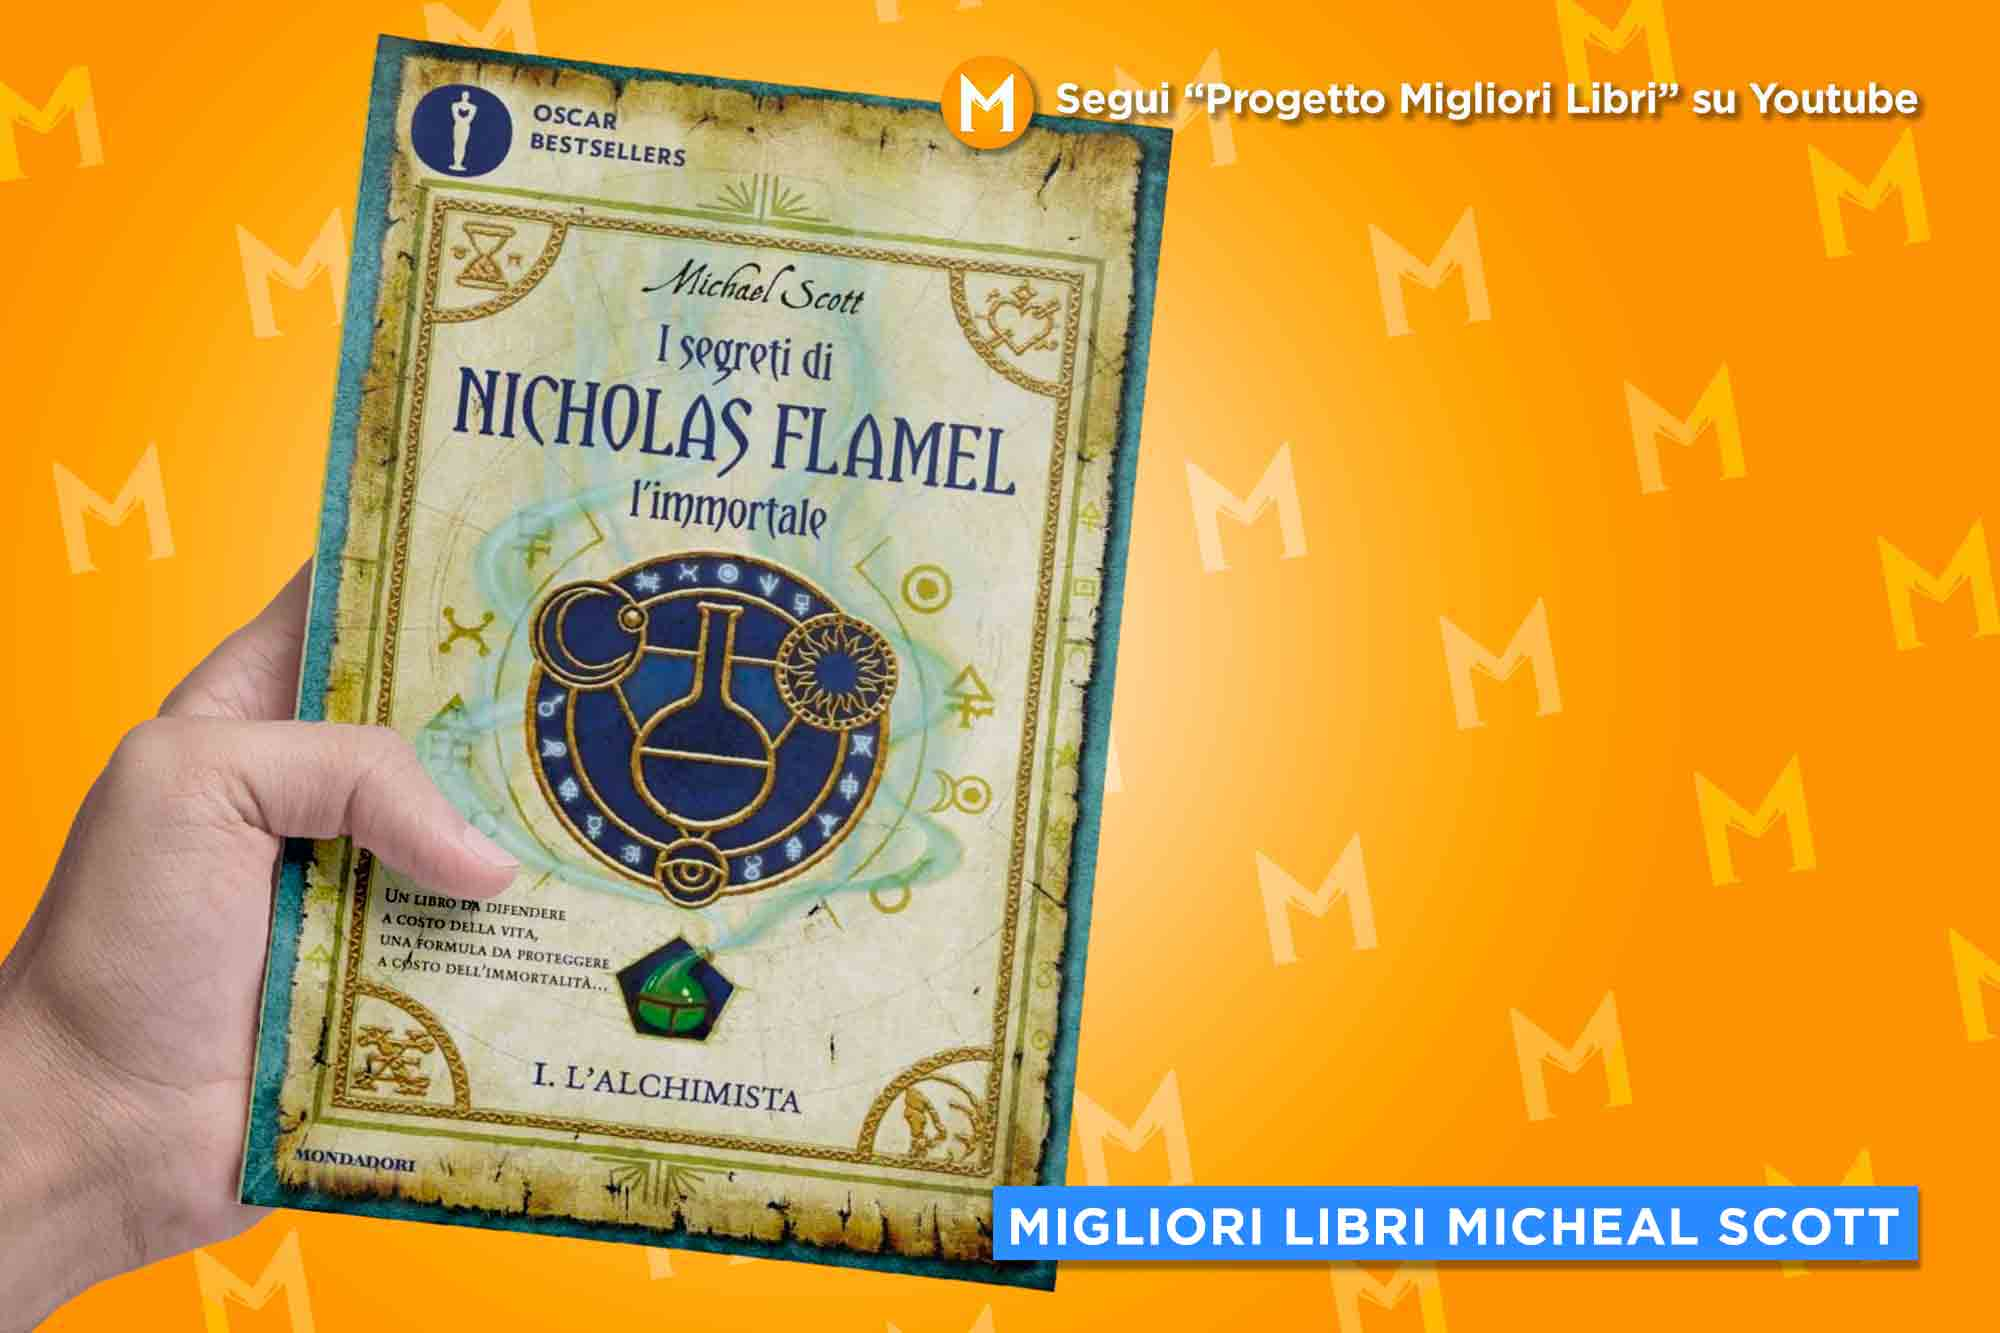 migliori-libri-micheal-scott